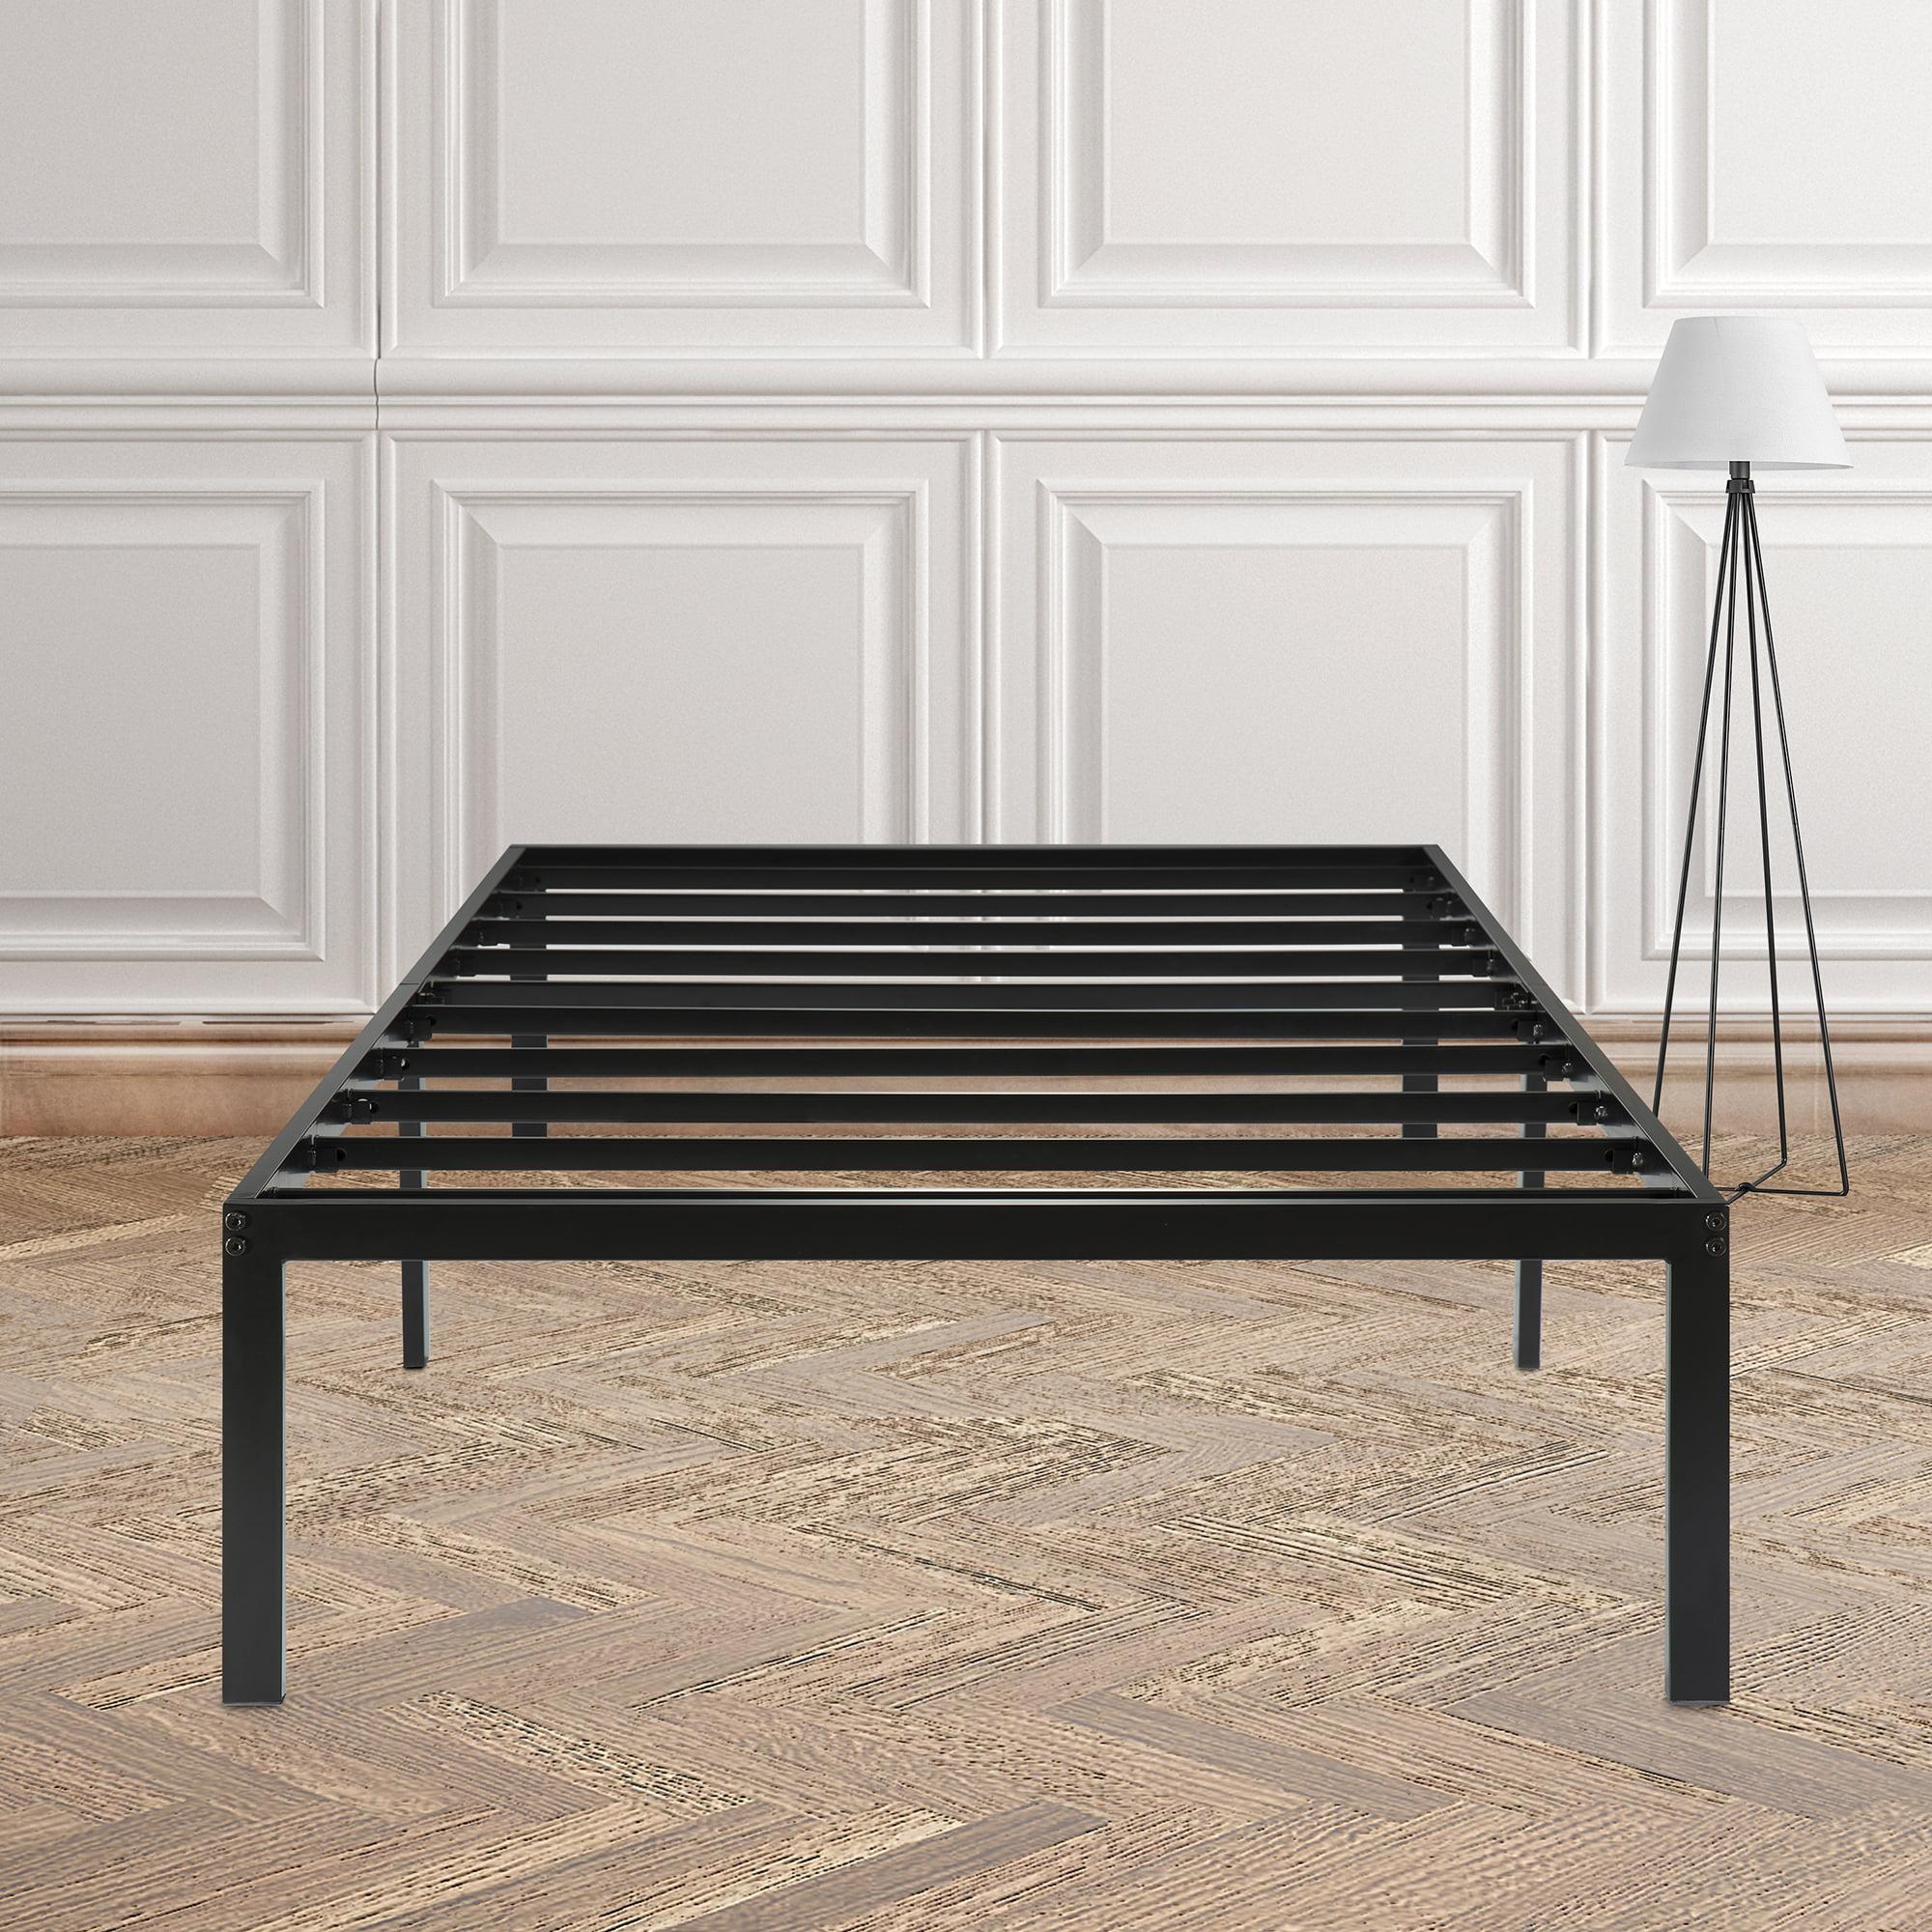 "GranRest 14"" Dura Metal Steel Slat Bed Frame, Twin size, Black by Grantec Co., Ltd"